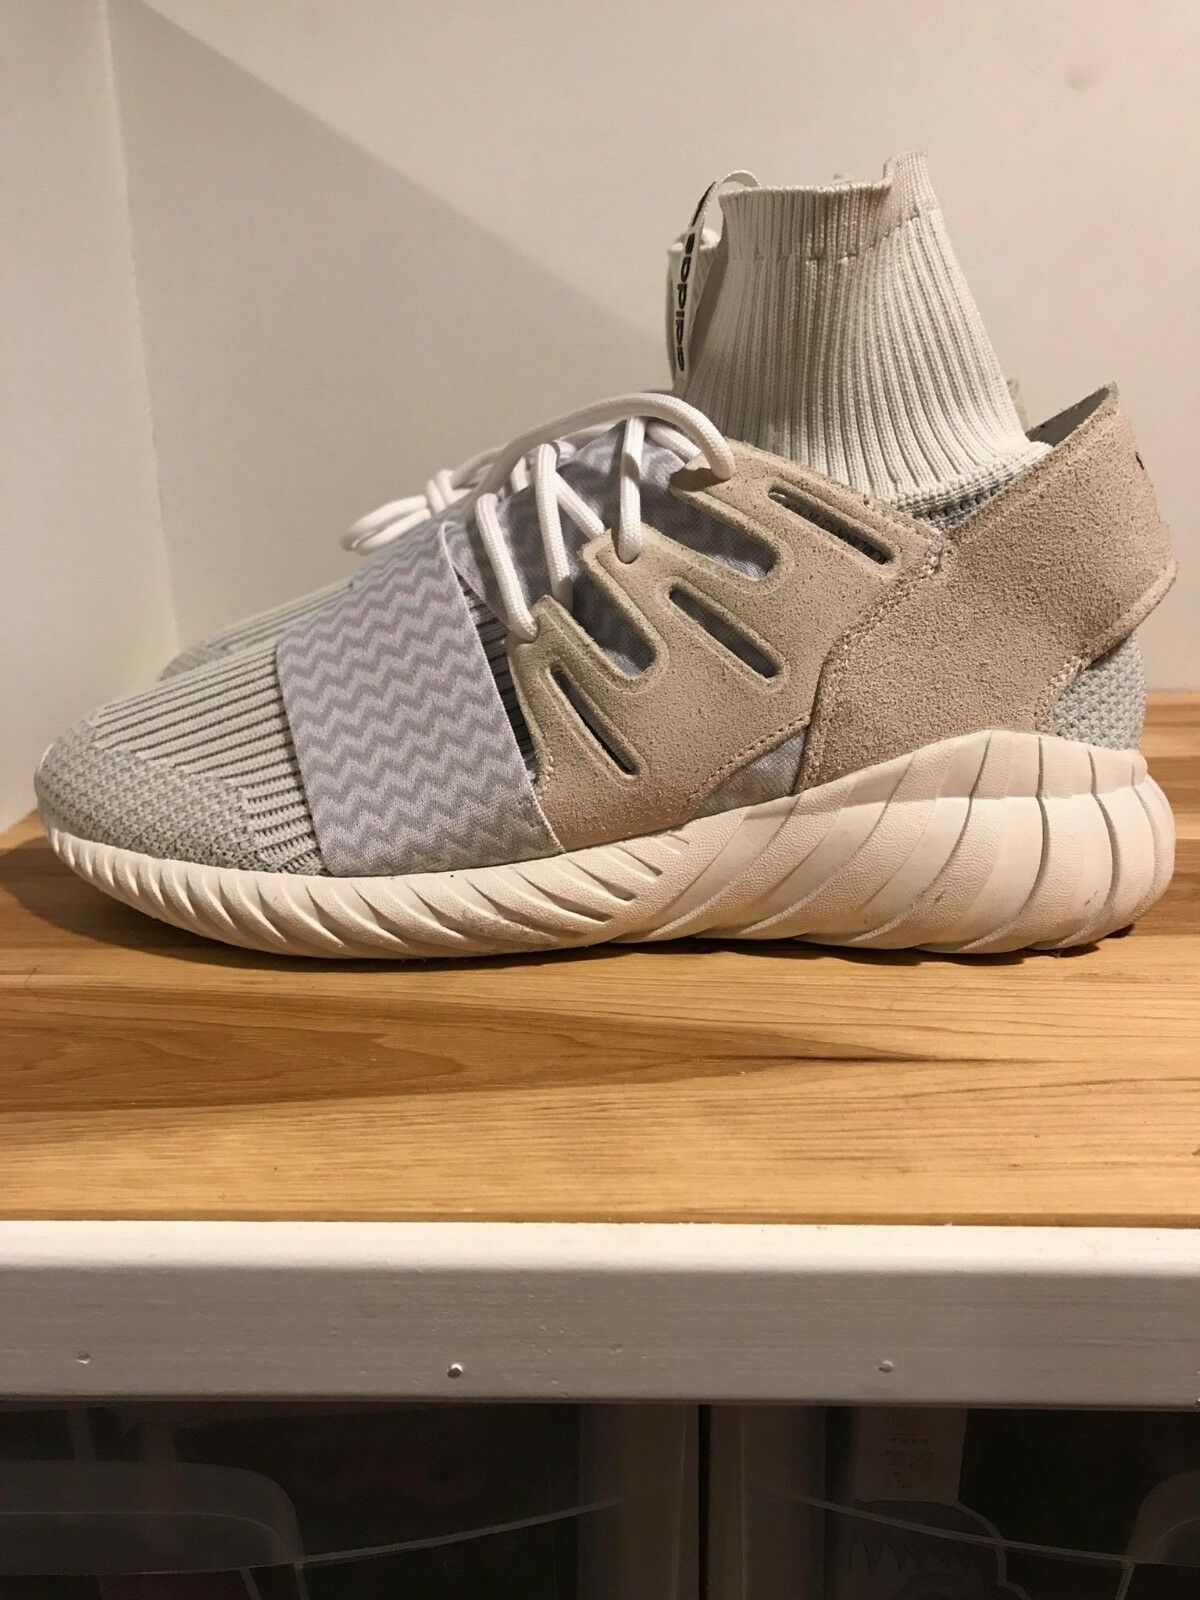 Adidas Originals Tubular Doom Primeknit Sneakers. Beige White. Men's Size 8.5.